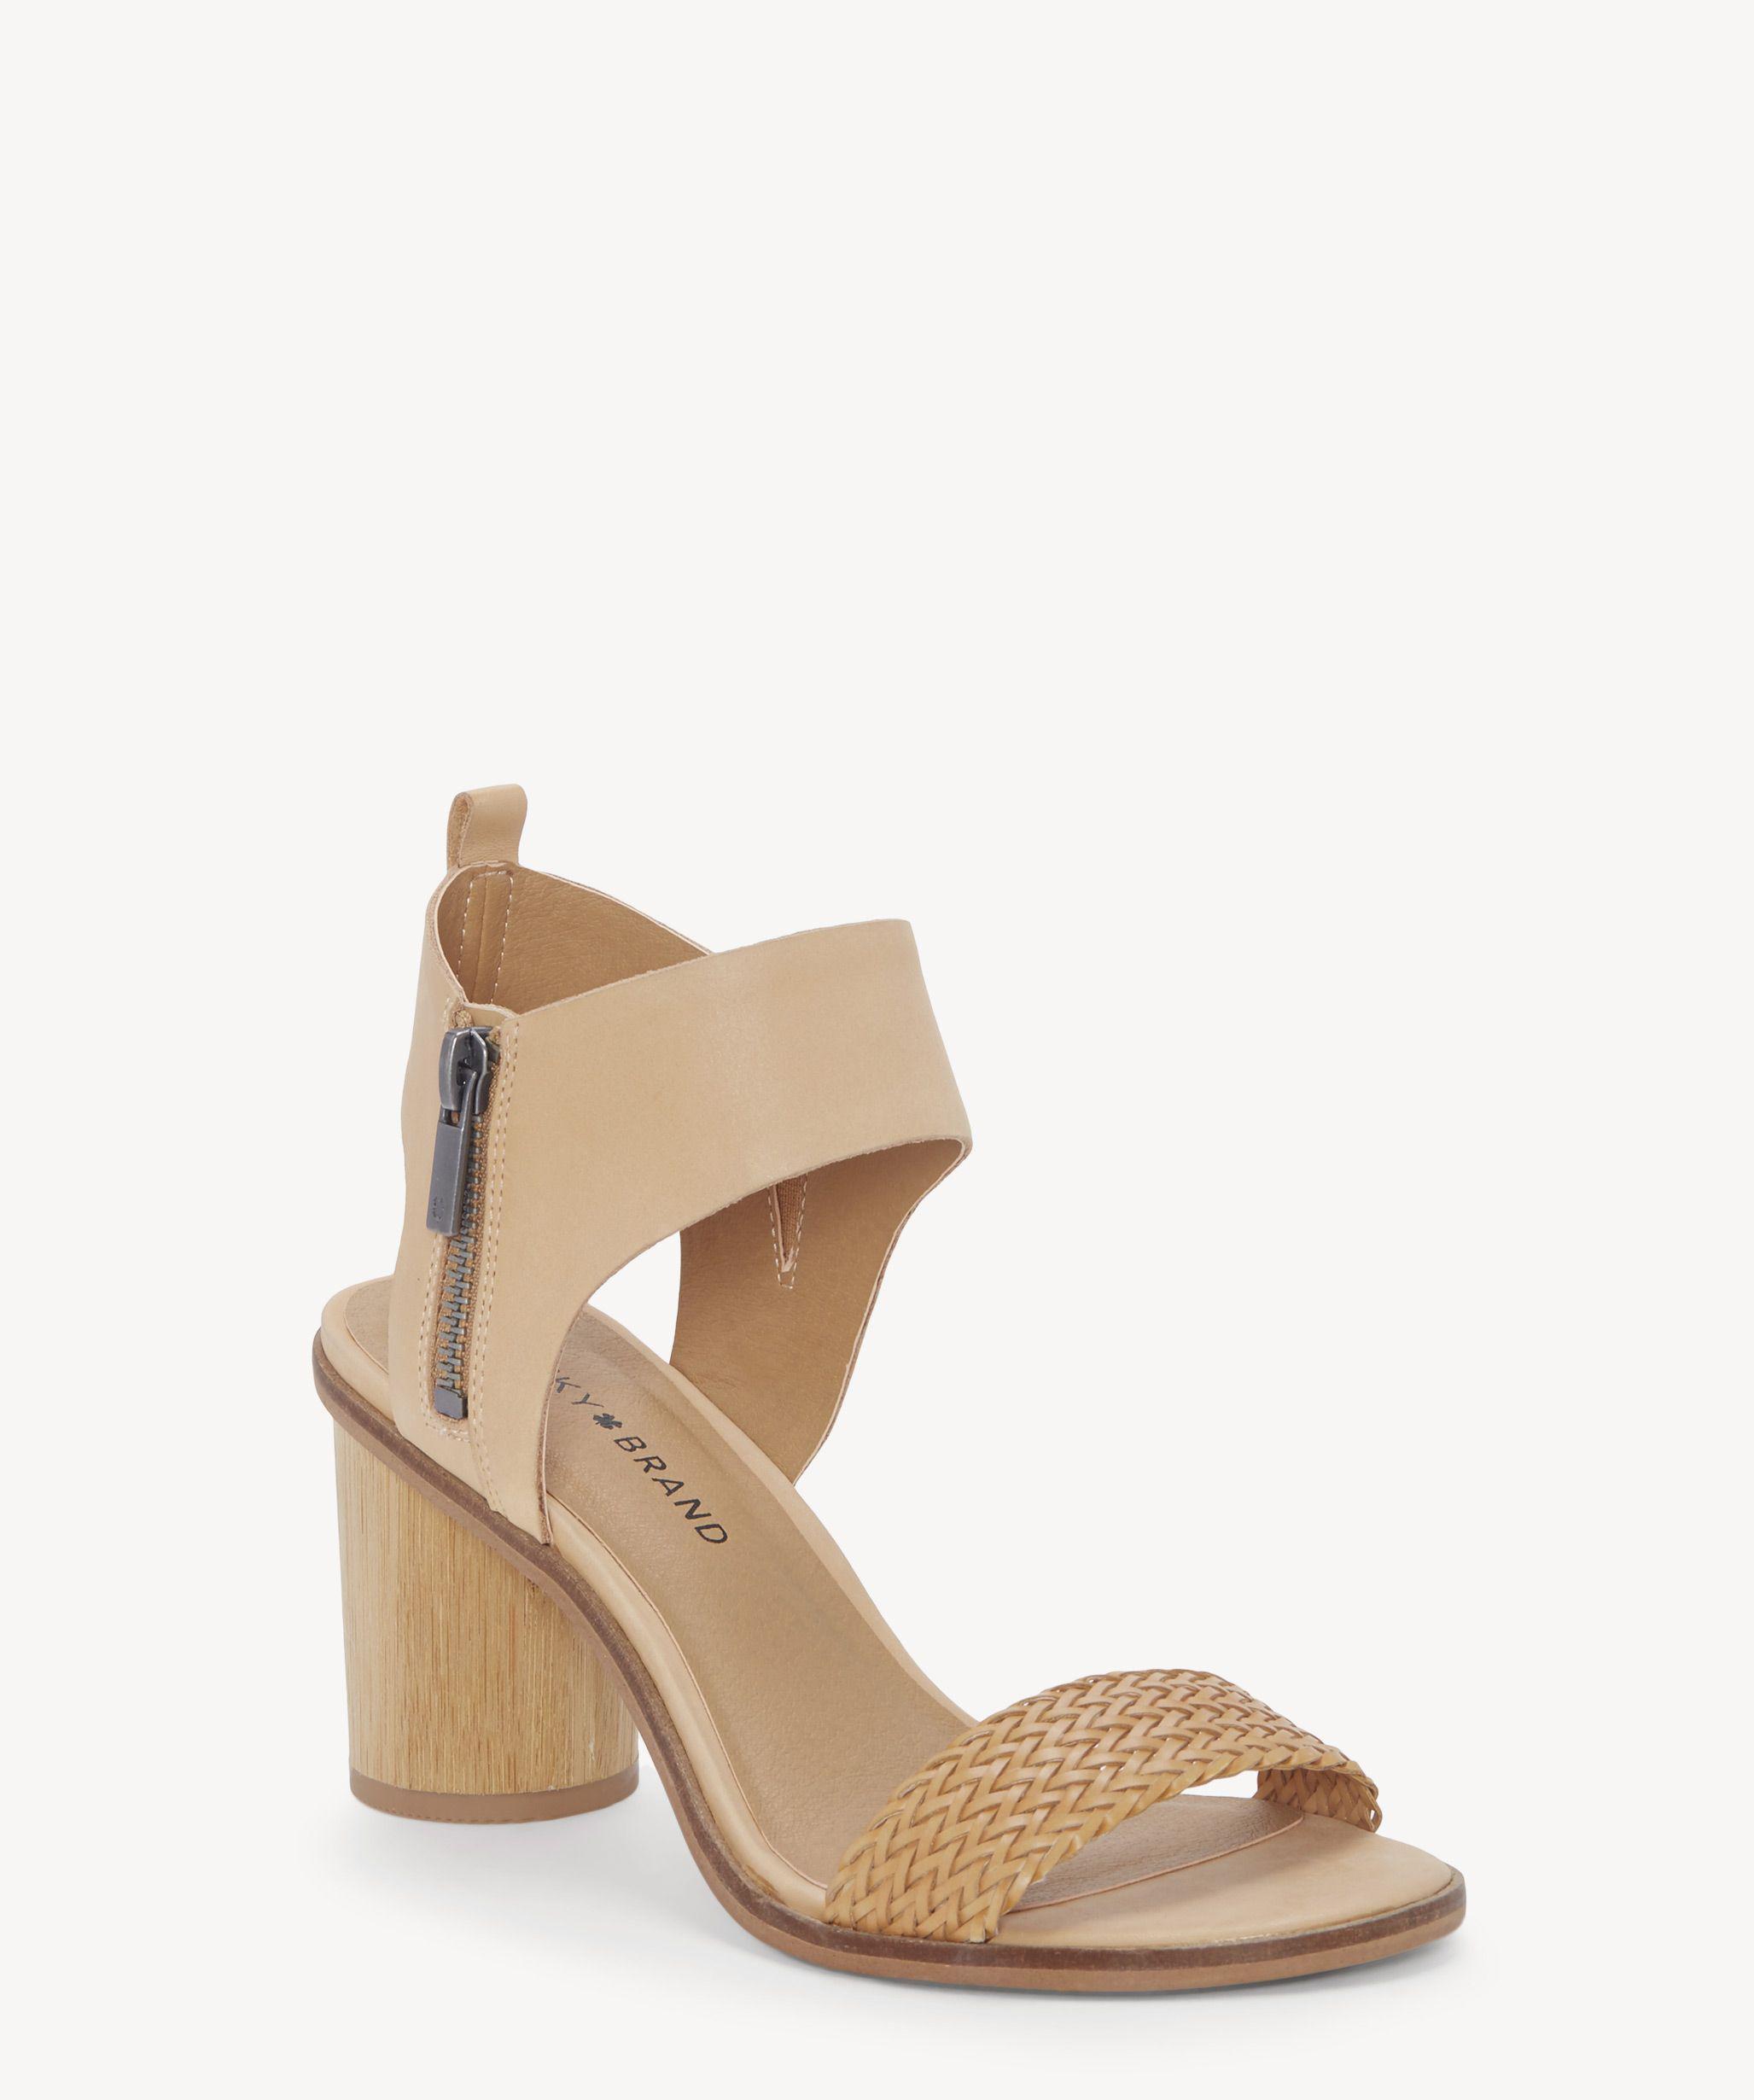 Lucky Brand Pomee Textile Leather Block Heel Dress Sandals nQHlTTd